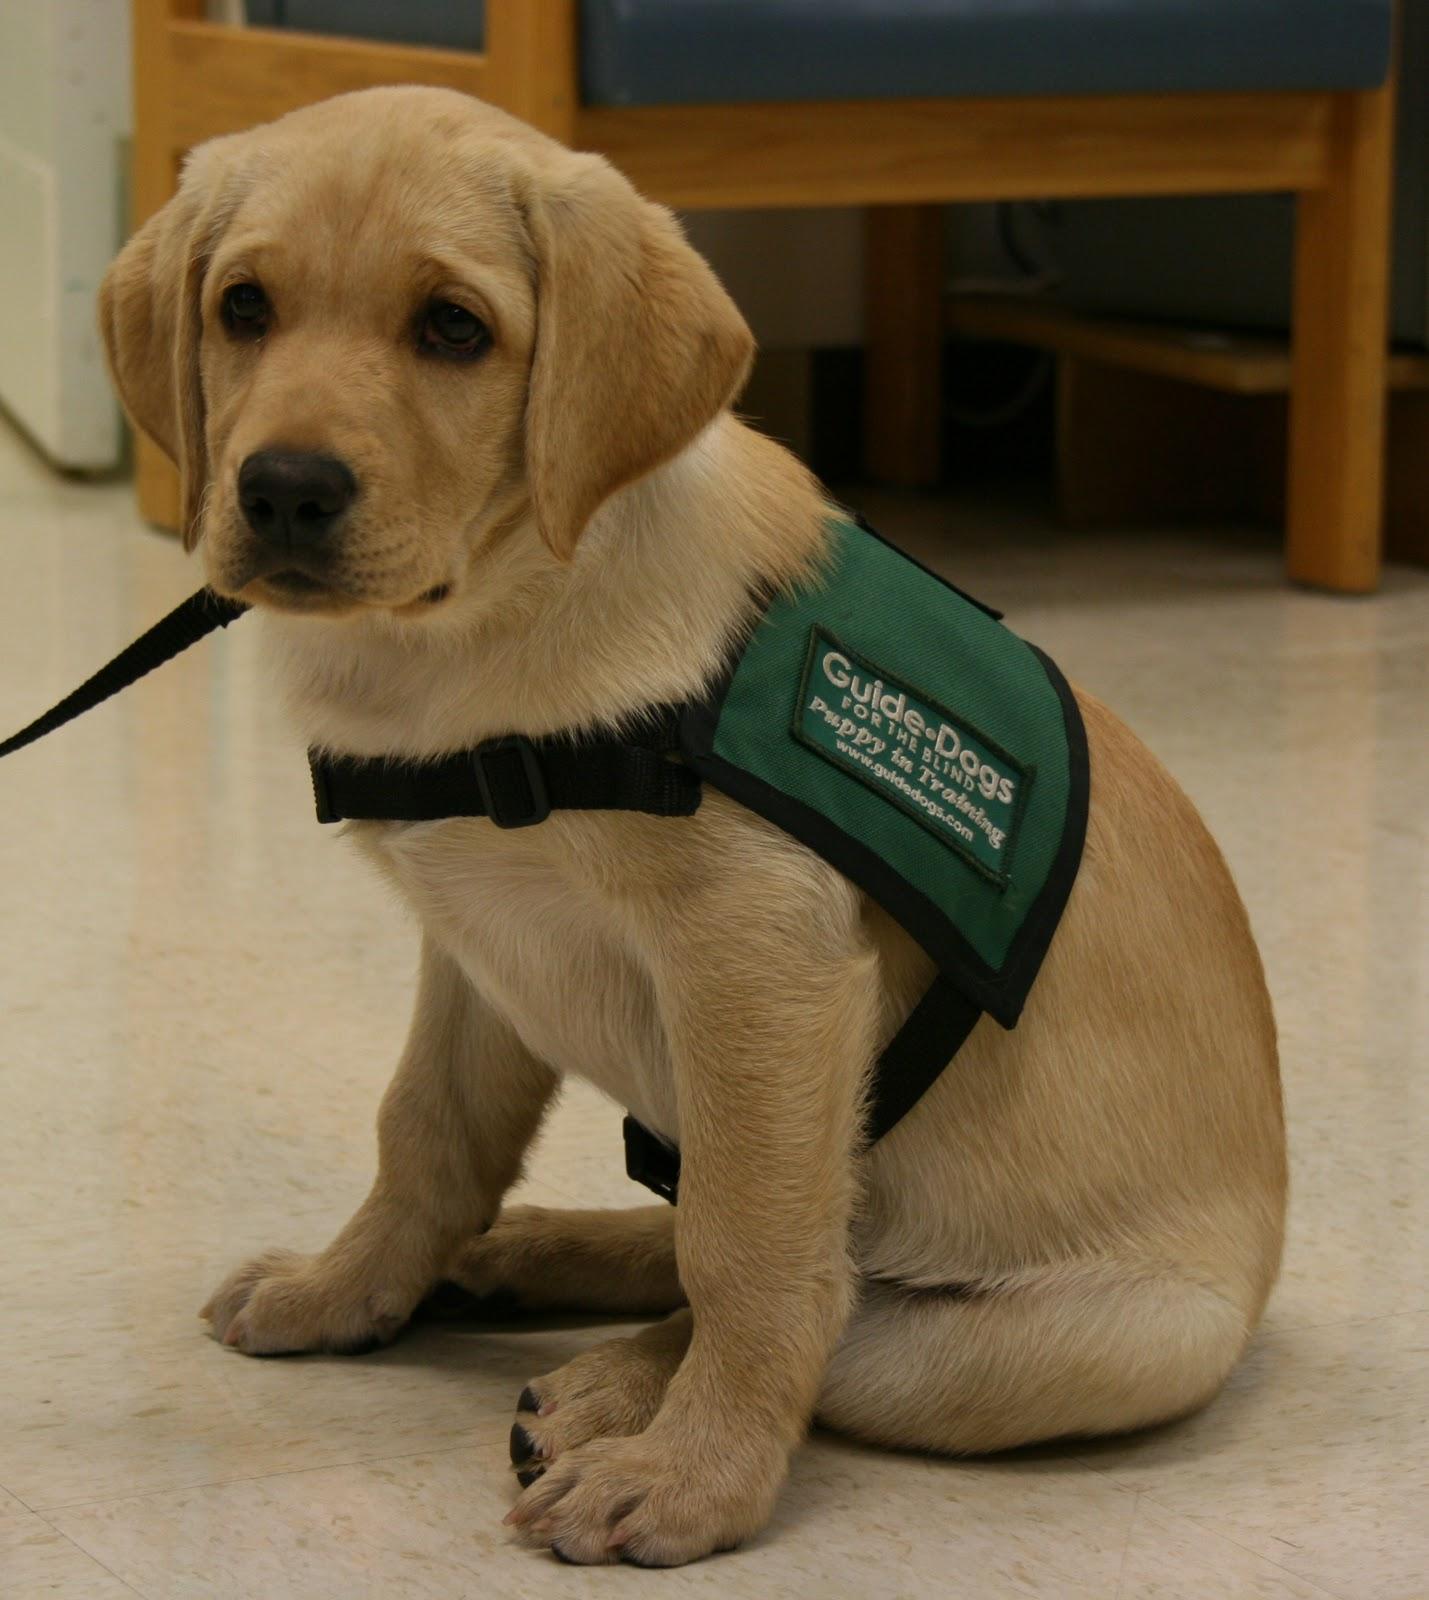 Guide dog - Wikipedia